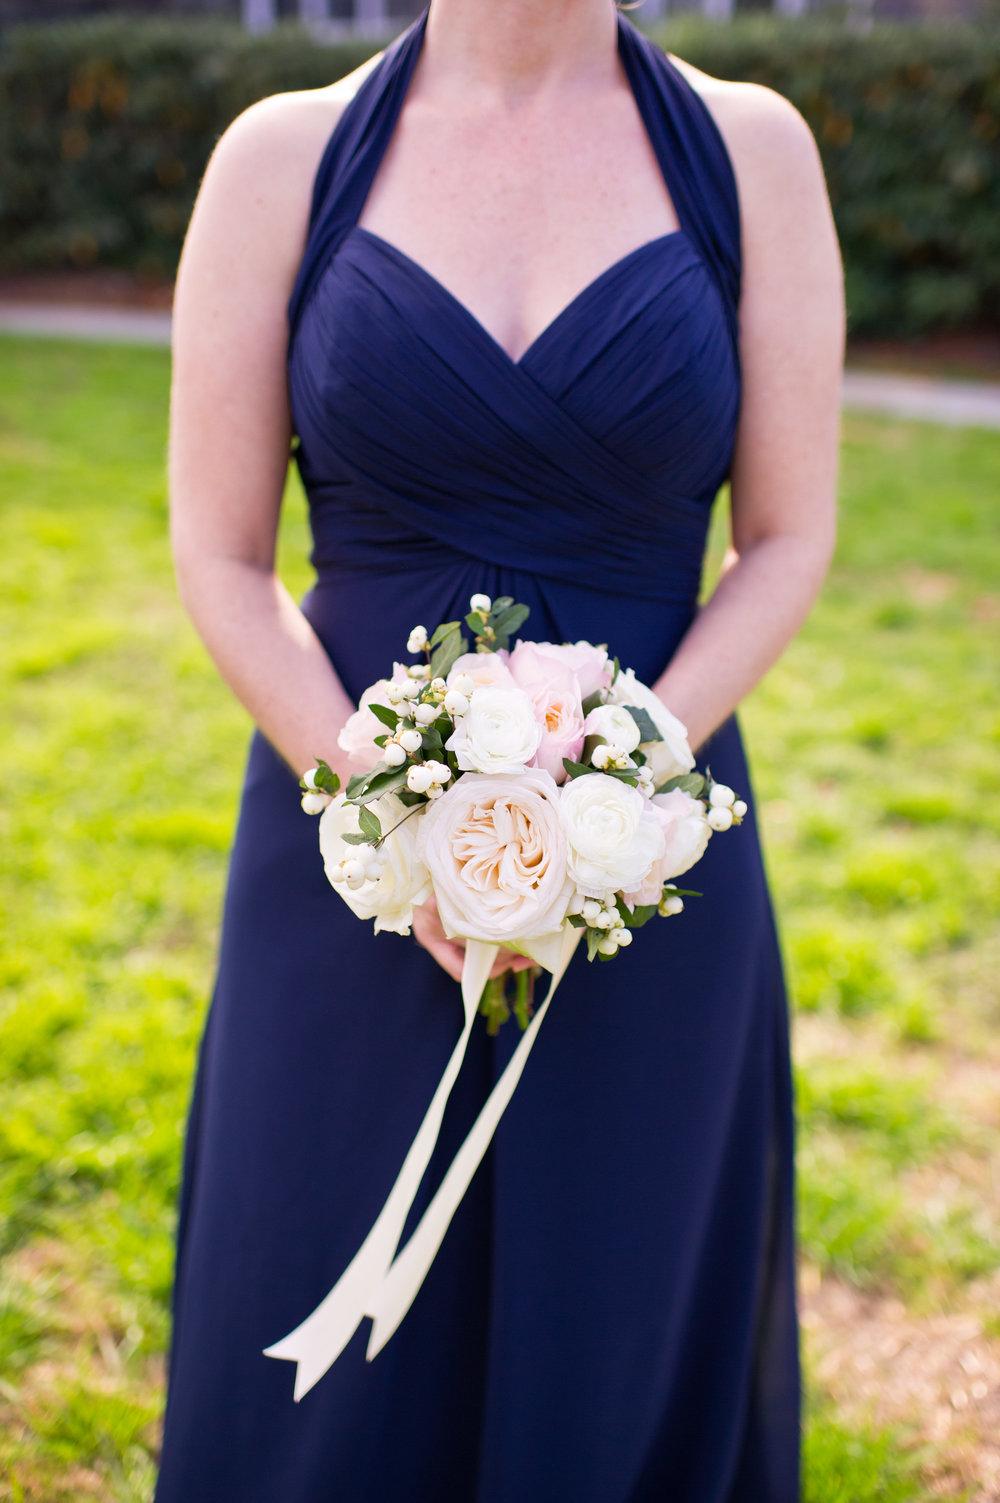 CT_Wedding_Planner_Crabtree_Kittle_House053.jpg